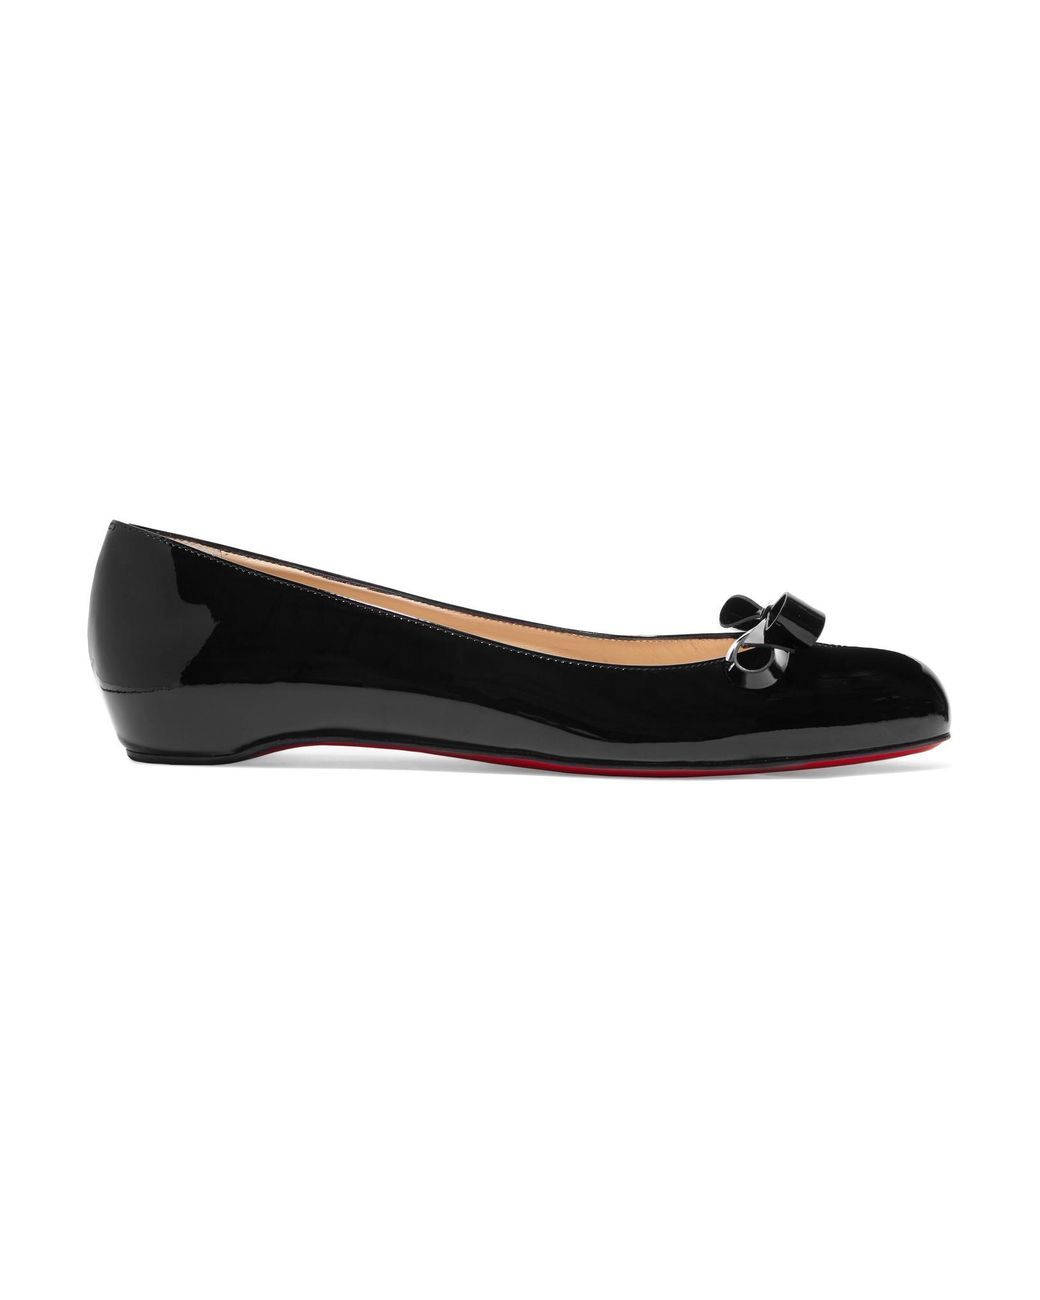 04a707857daf Christian Louboutin - Black Vinodo Bow-embellished Patent-leather Ballet  Flats - Lyst